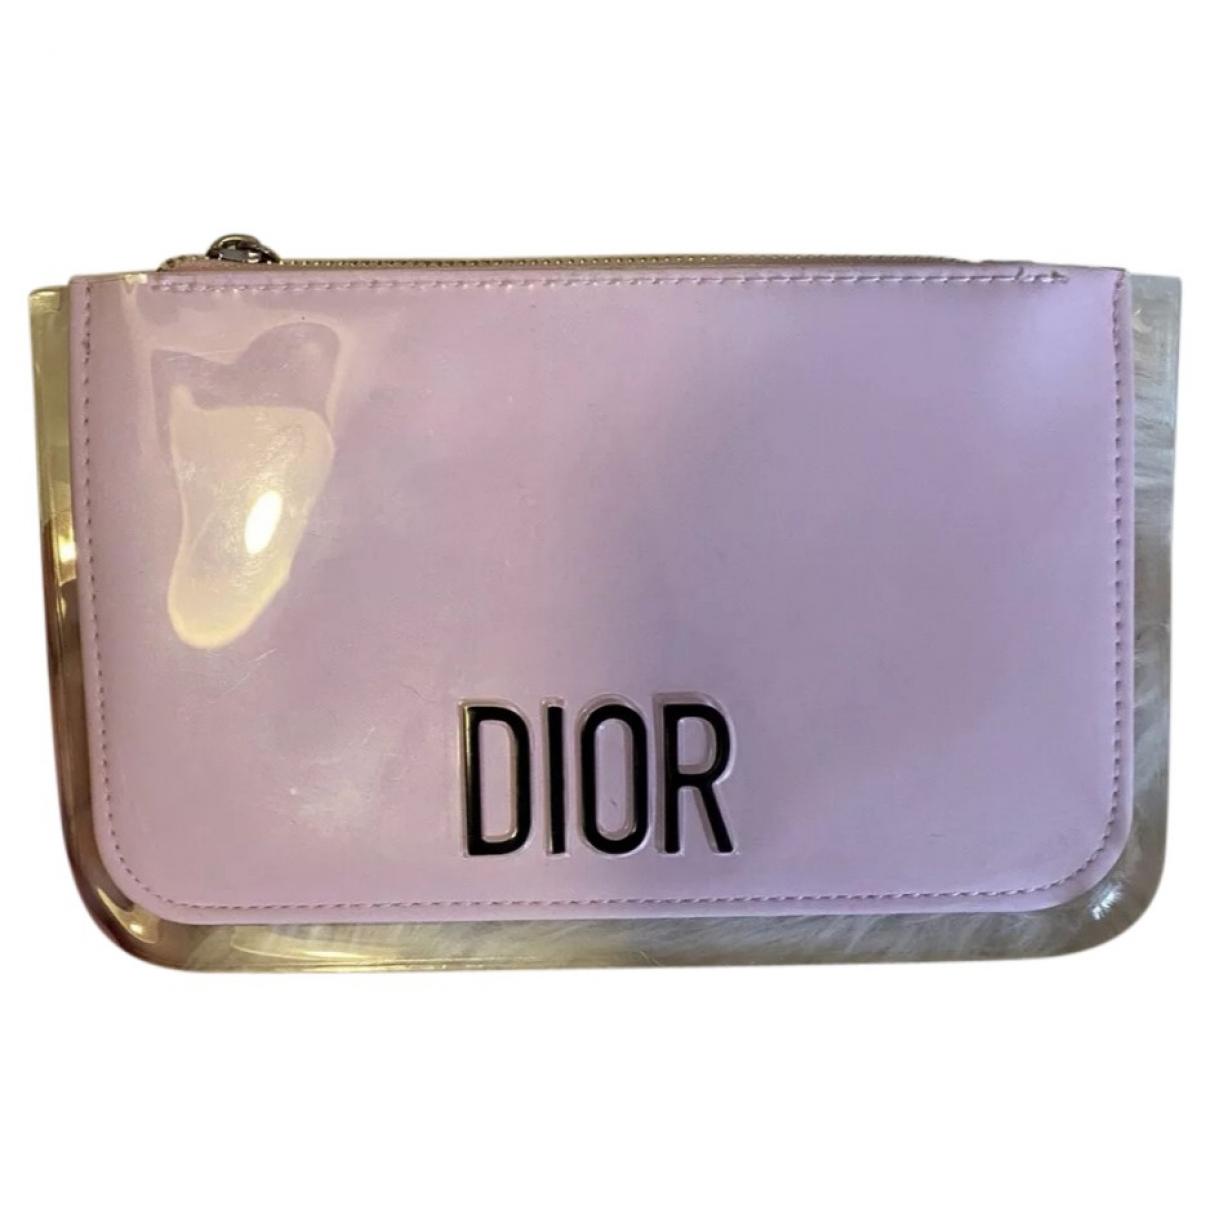 Dior \N Pink Clutch bag for Women \N